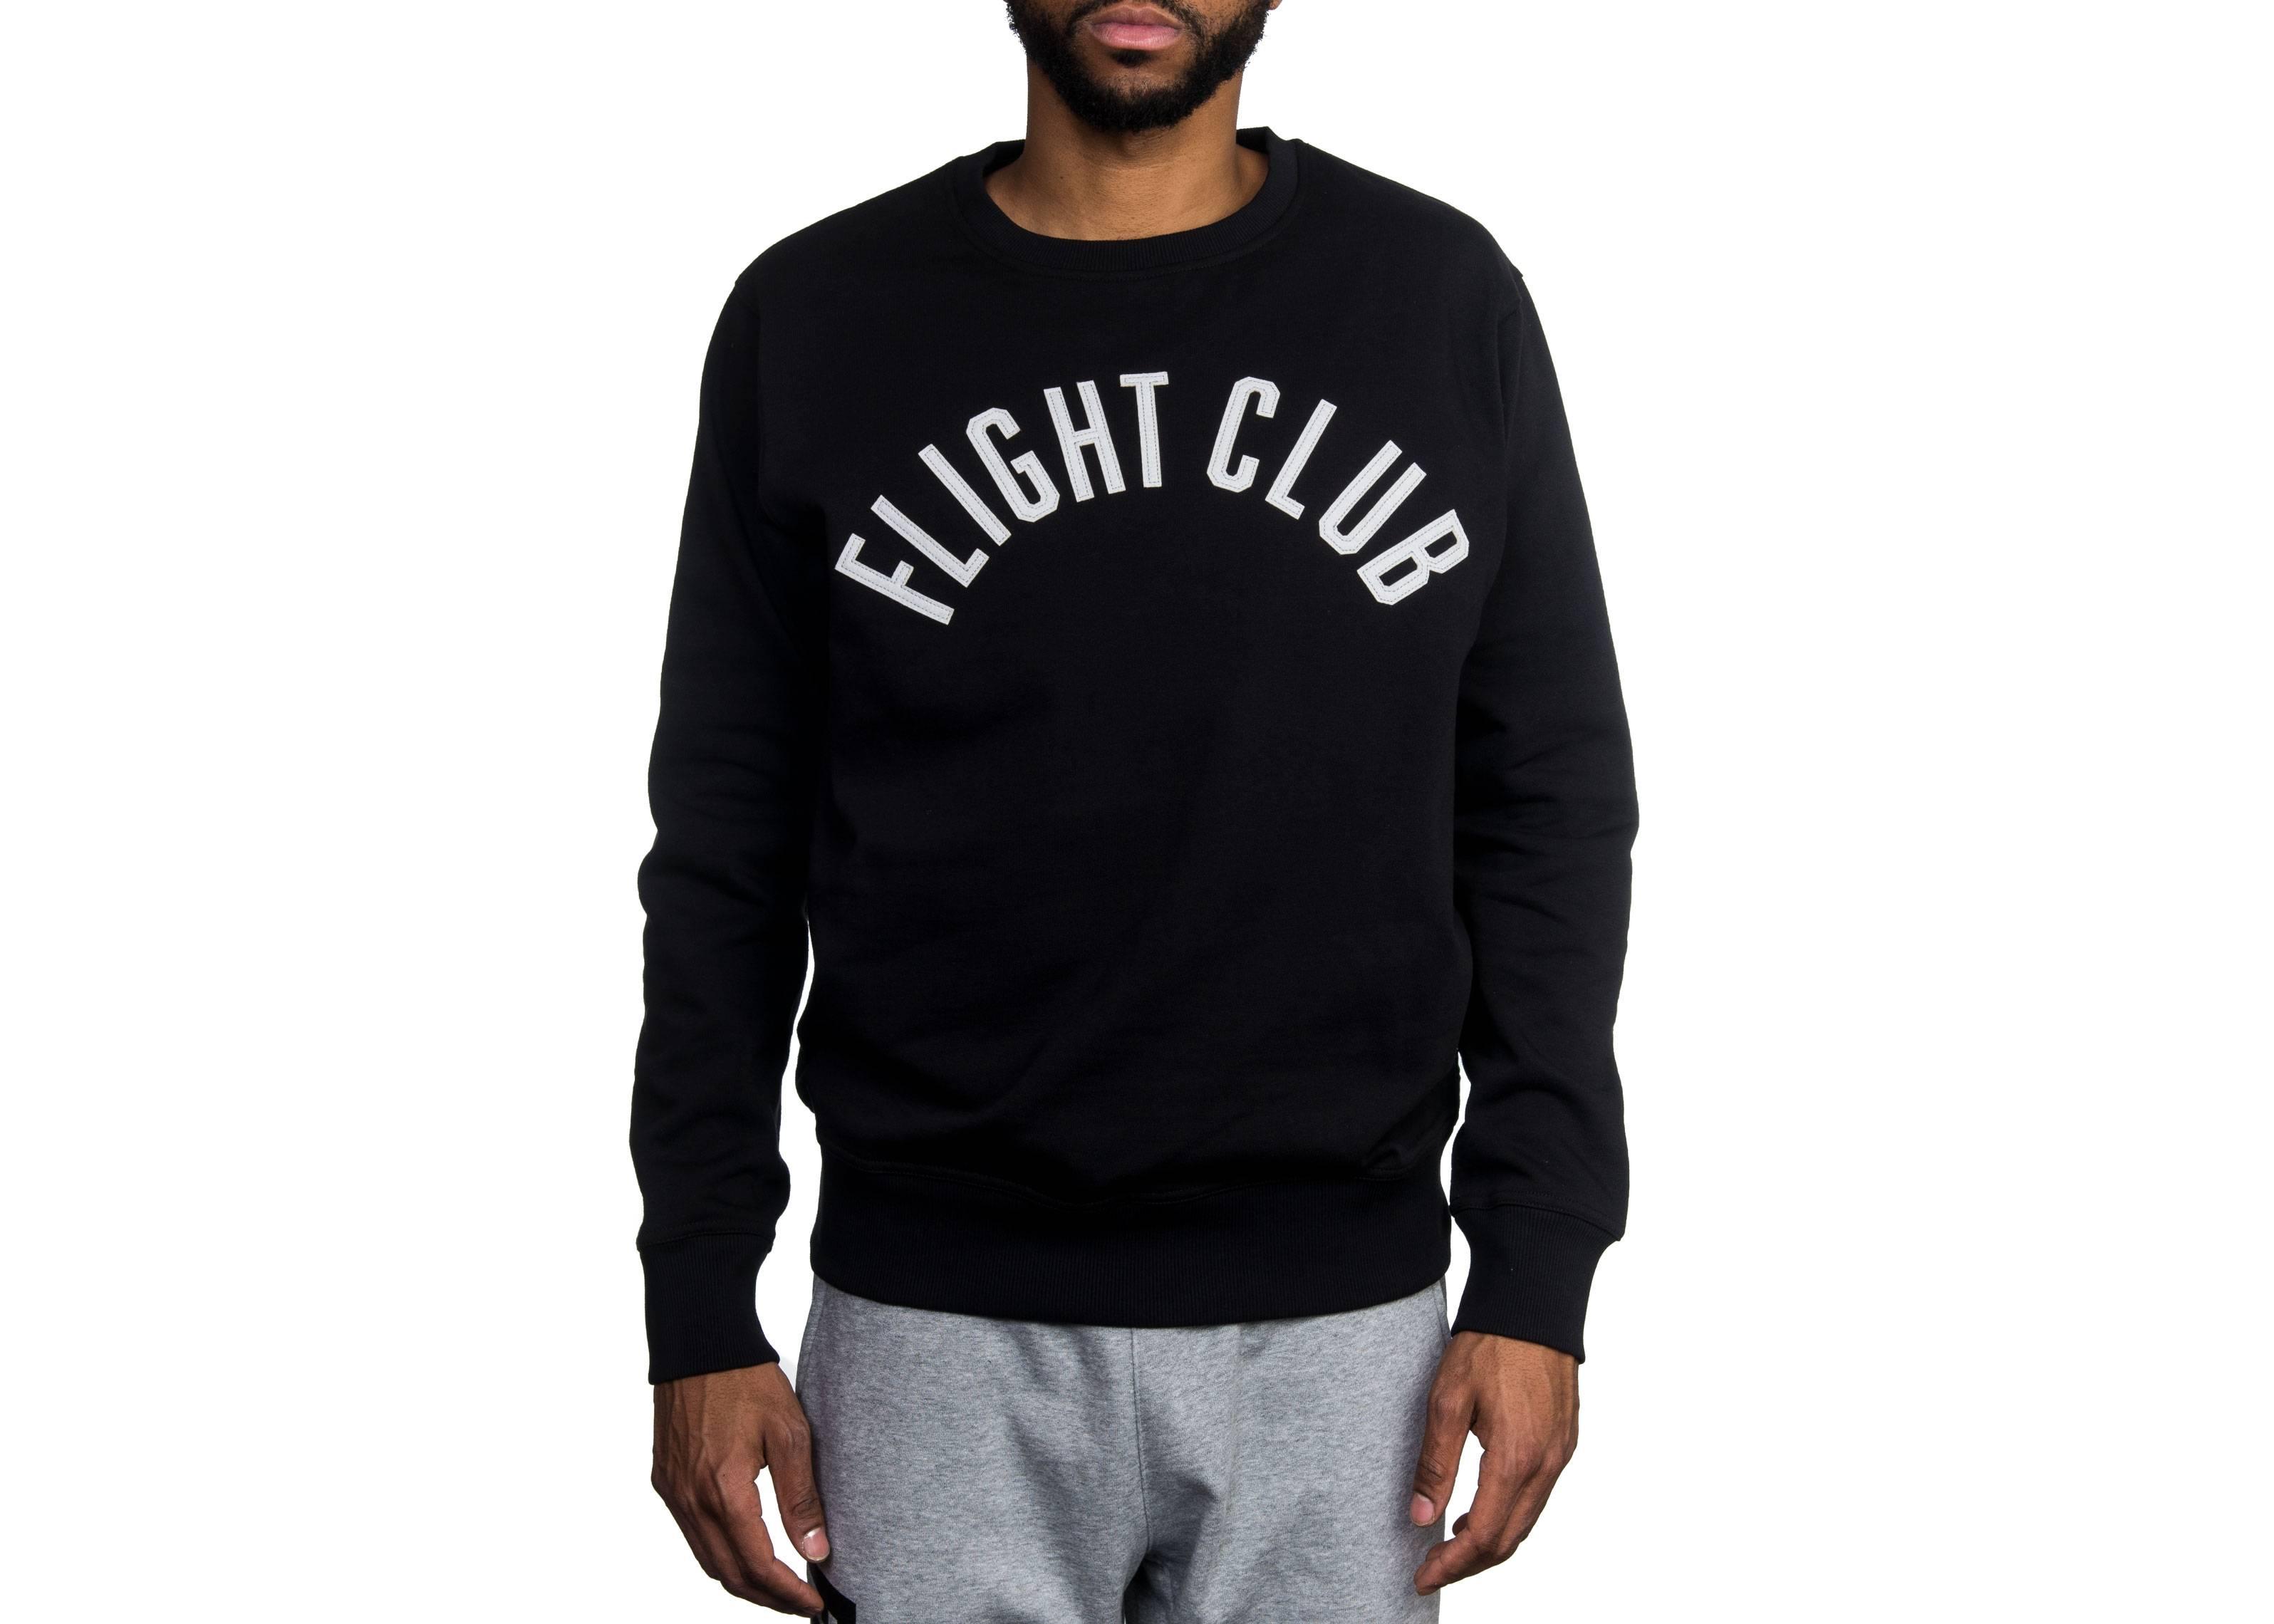 17fd52c7abf5 University Crew Neck Sweatshirt - Flight Club - FCSW07 17 - black ...